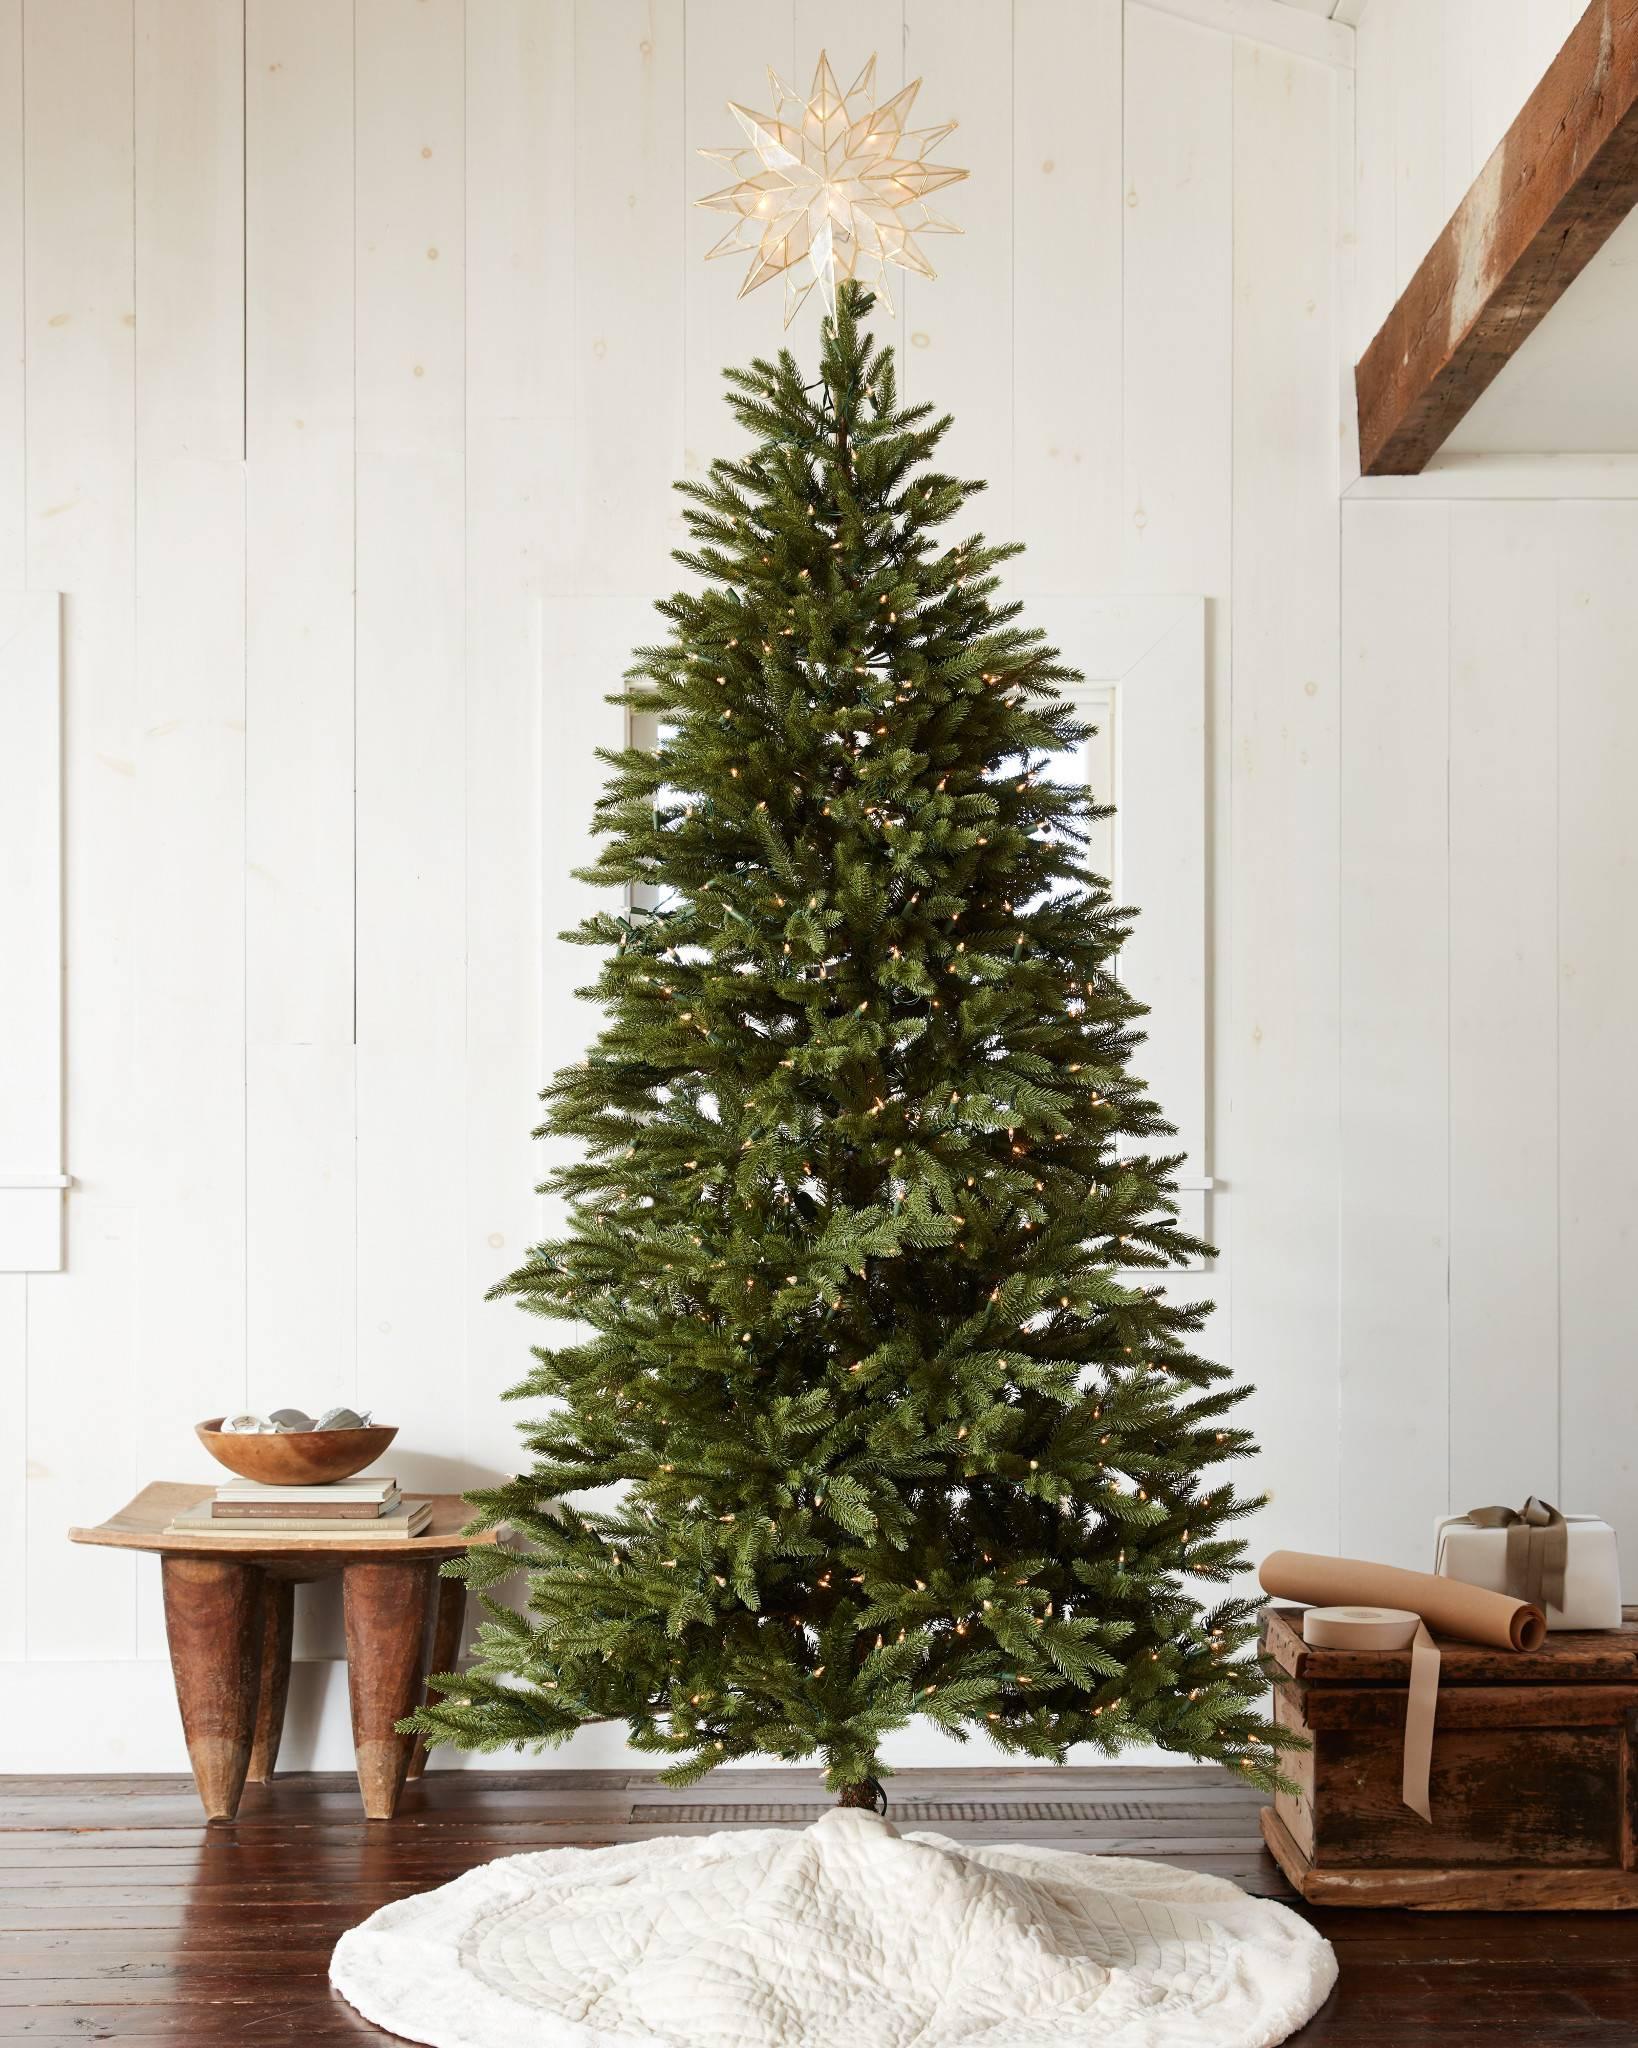 silverado slim artificial christmas tree in home by balsam hill - 7ft Slim Christmas Tree